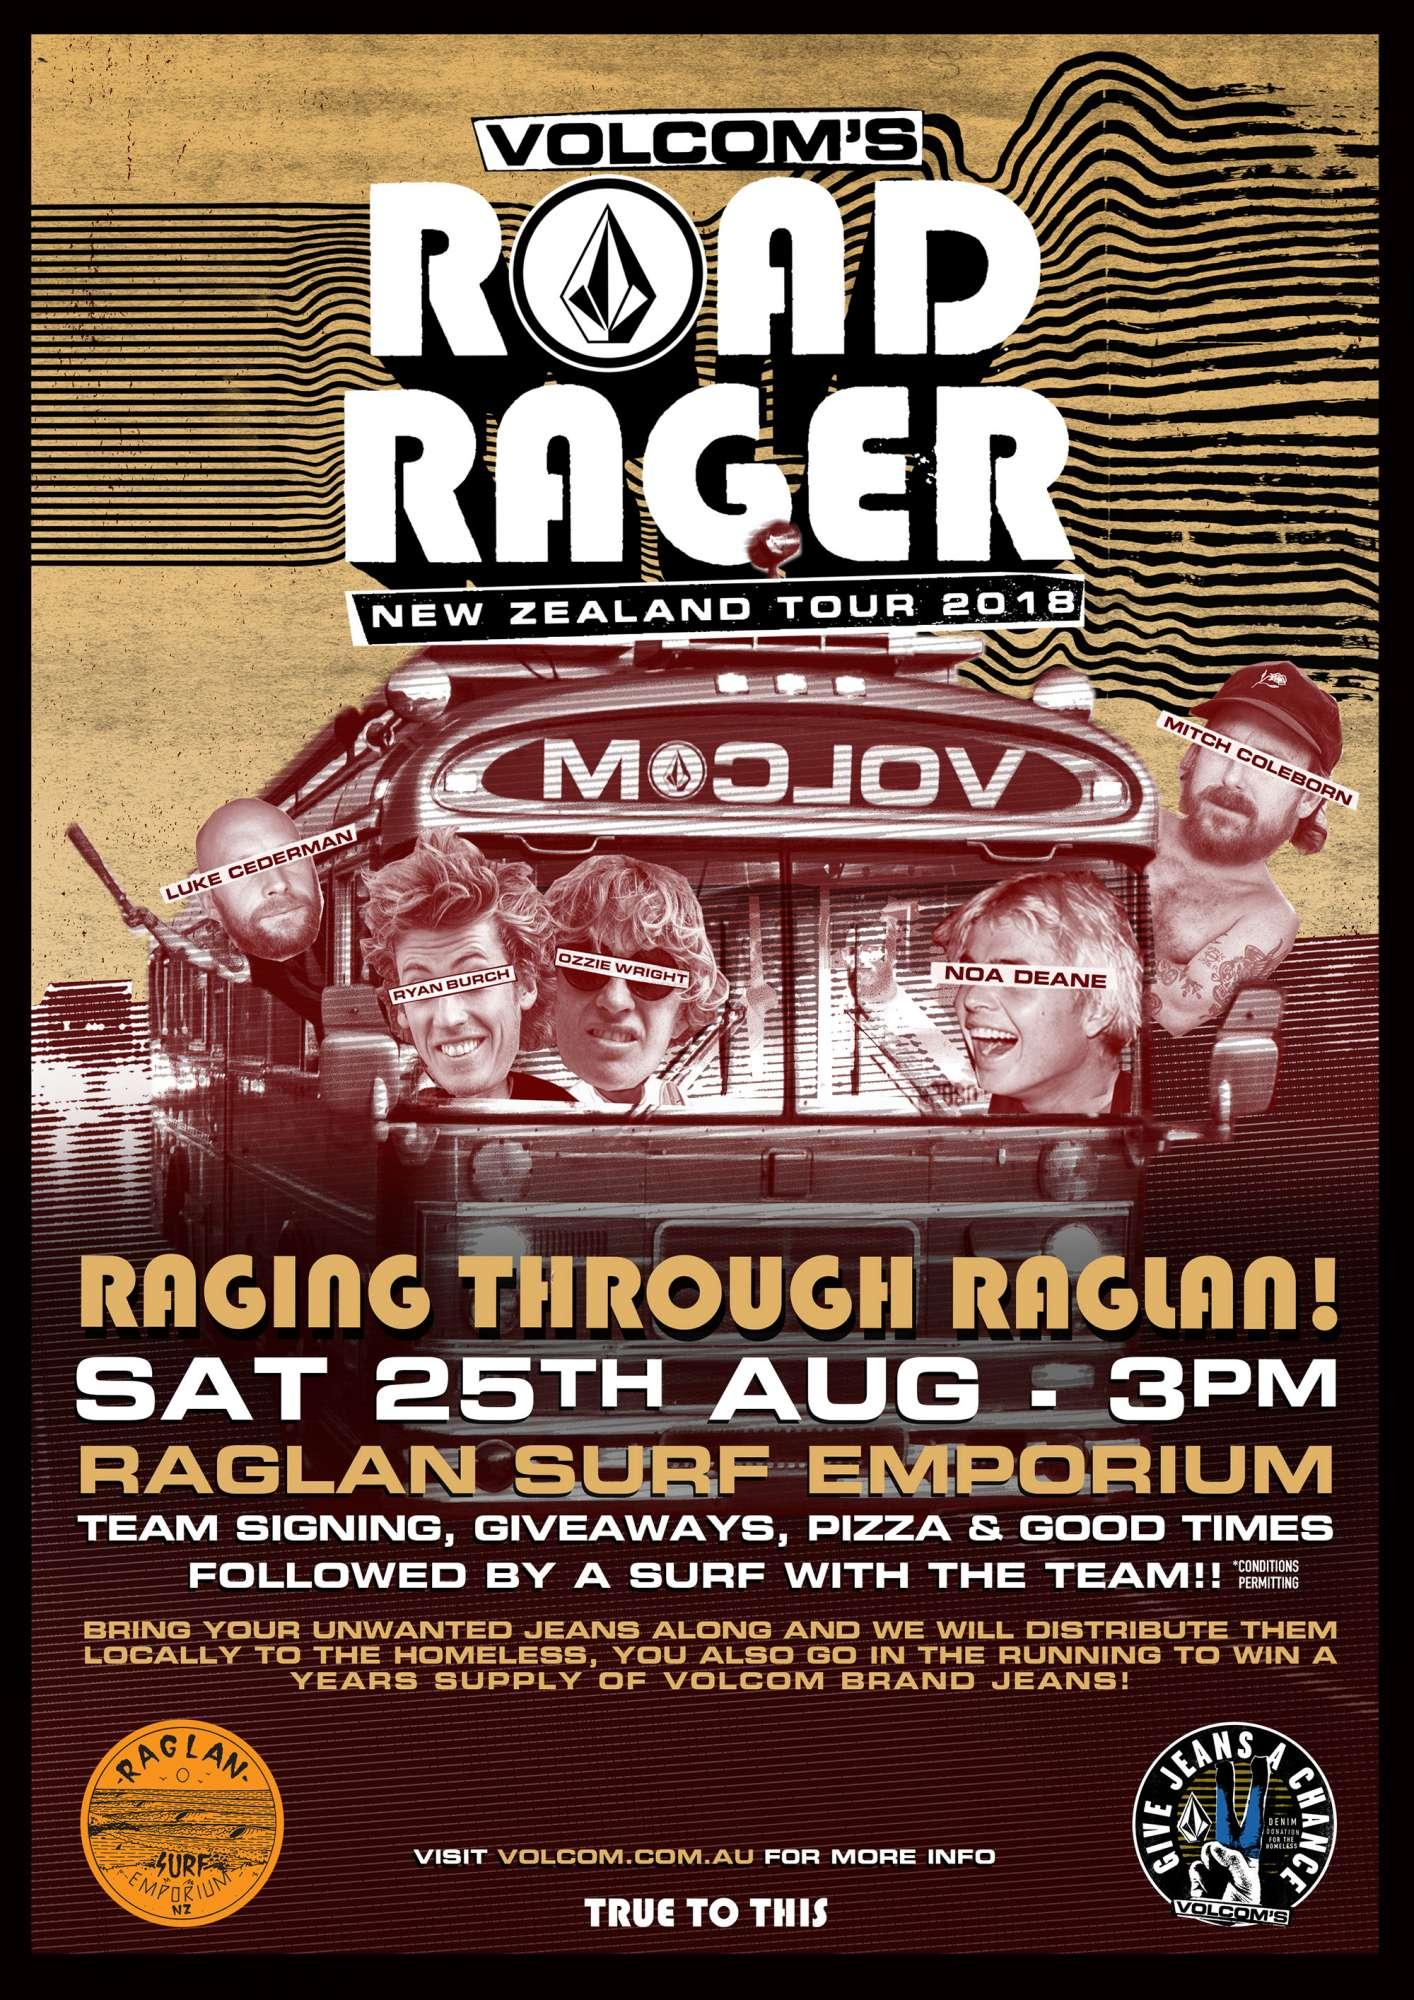 Volcom Road Rager Raglan Demo